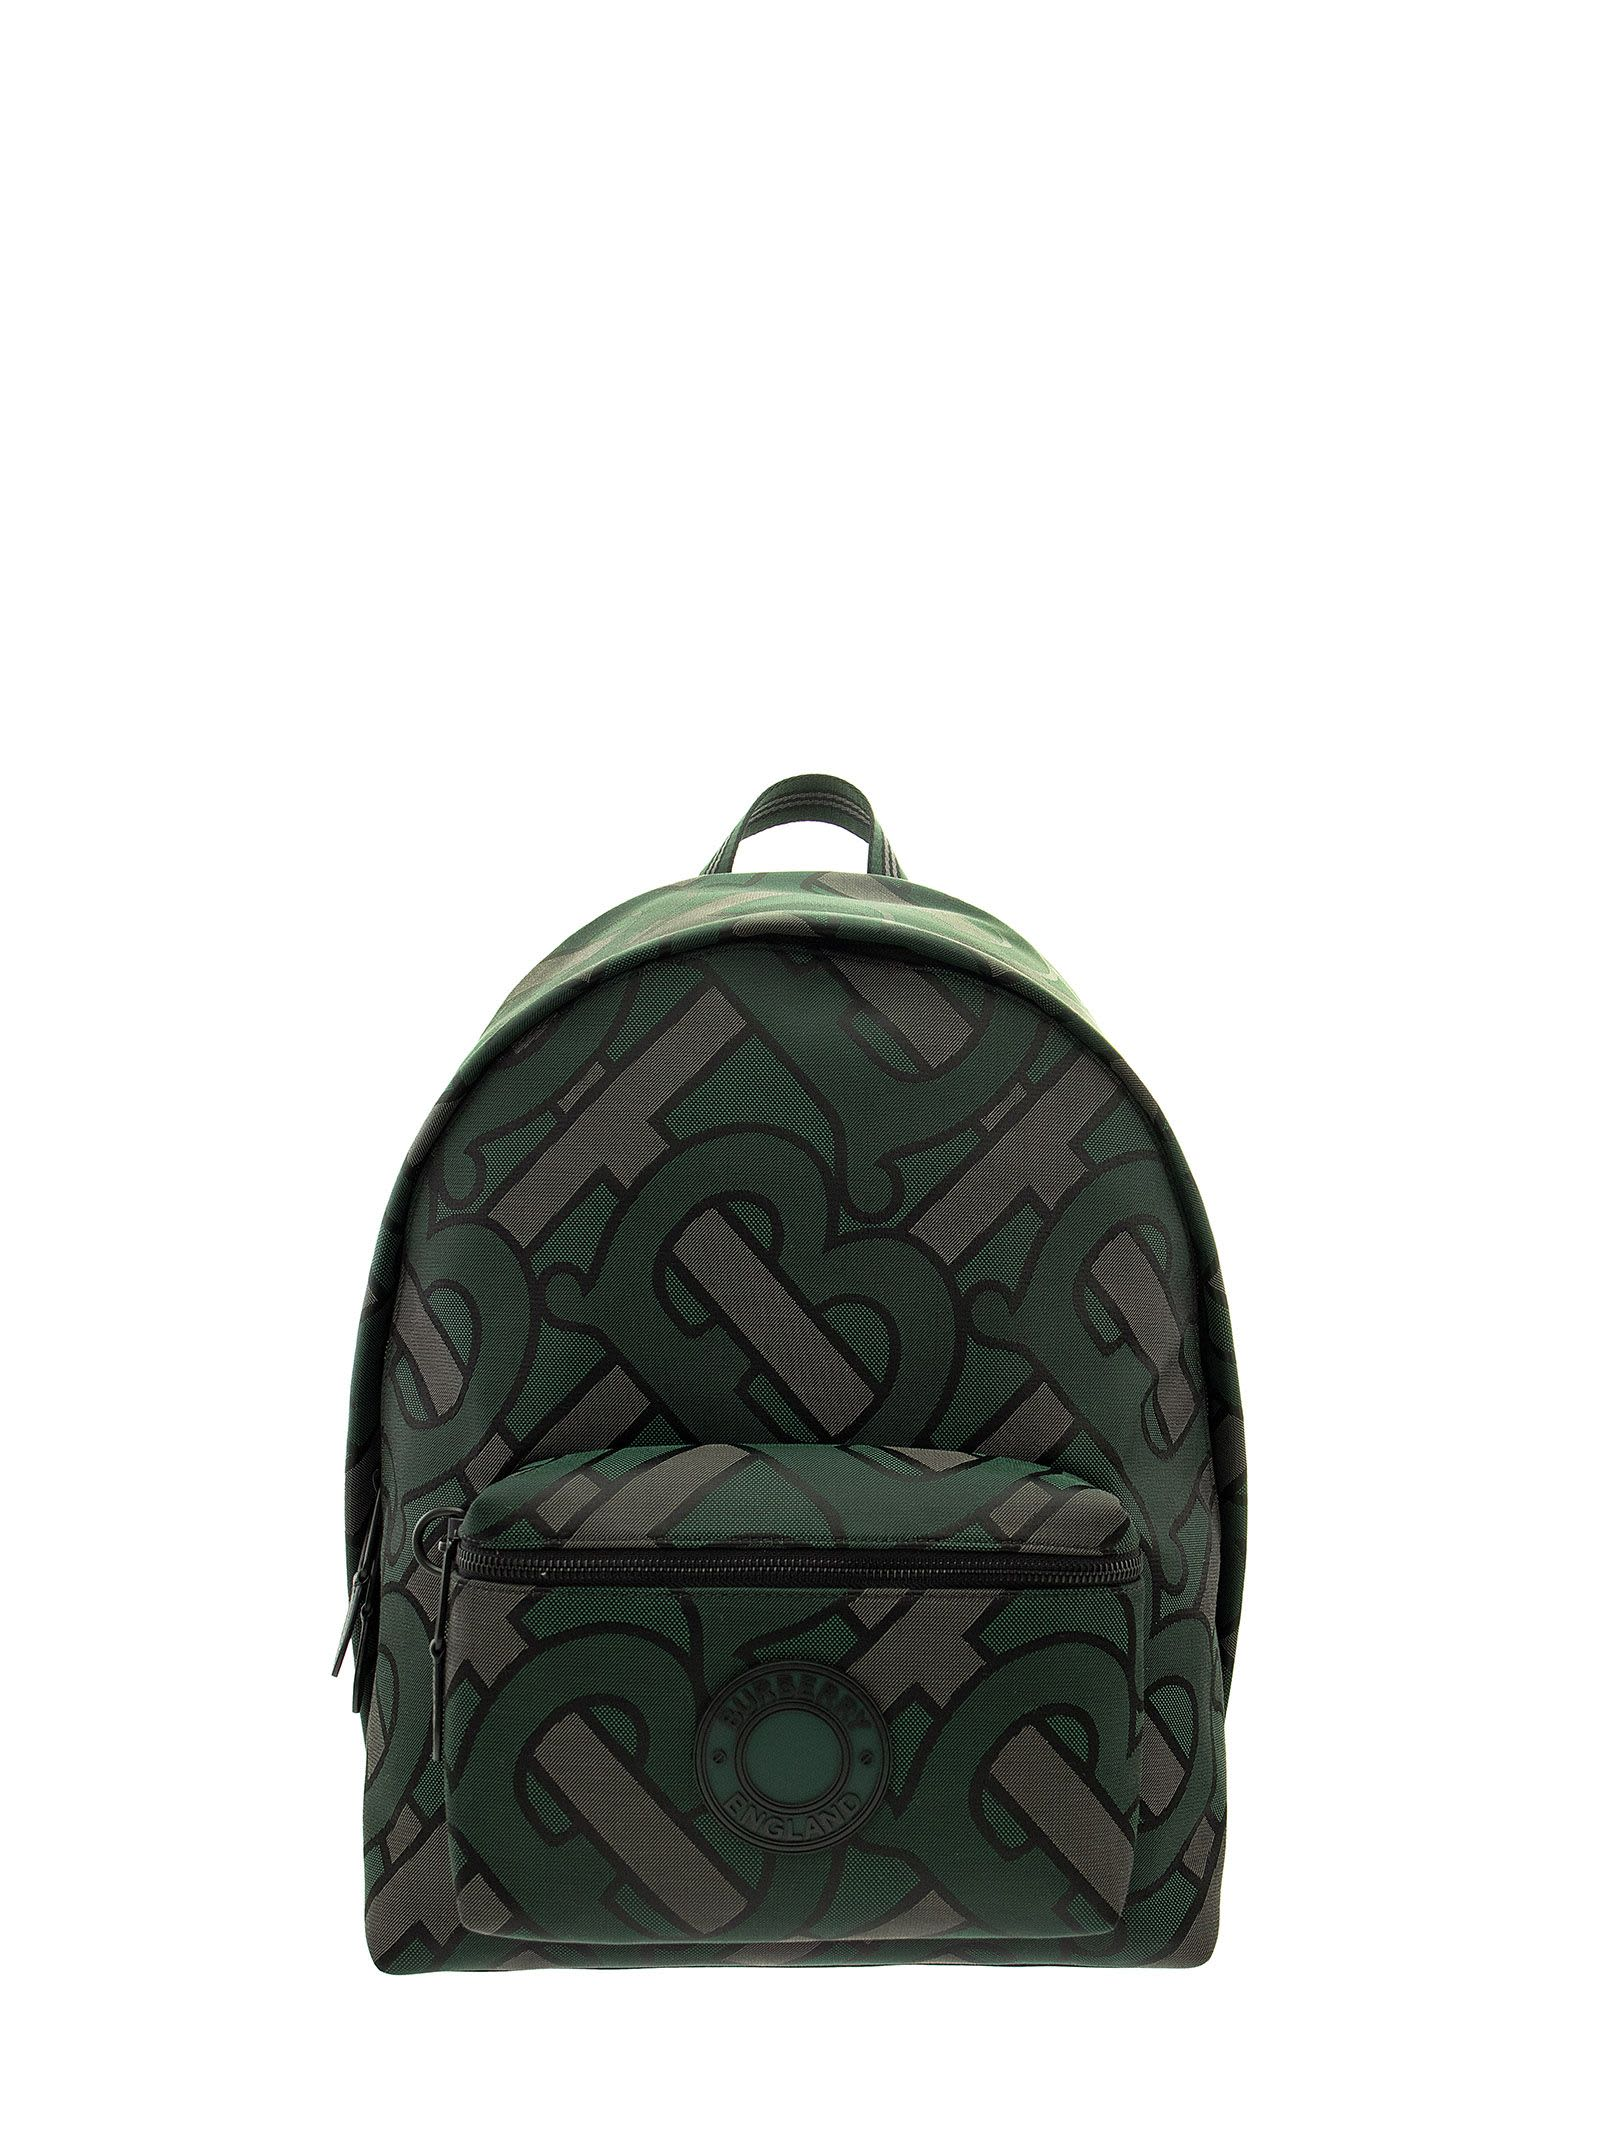 Burberry Jett - Monogram Recycled Polyester Jacquard Backpack